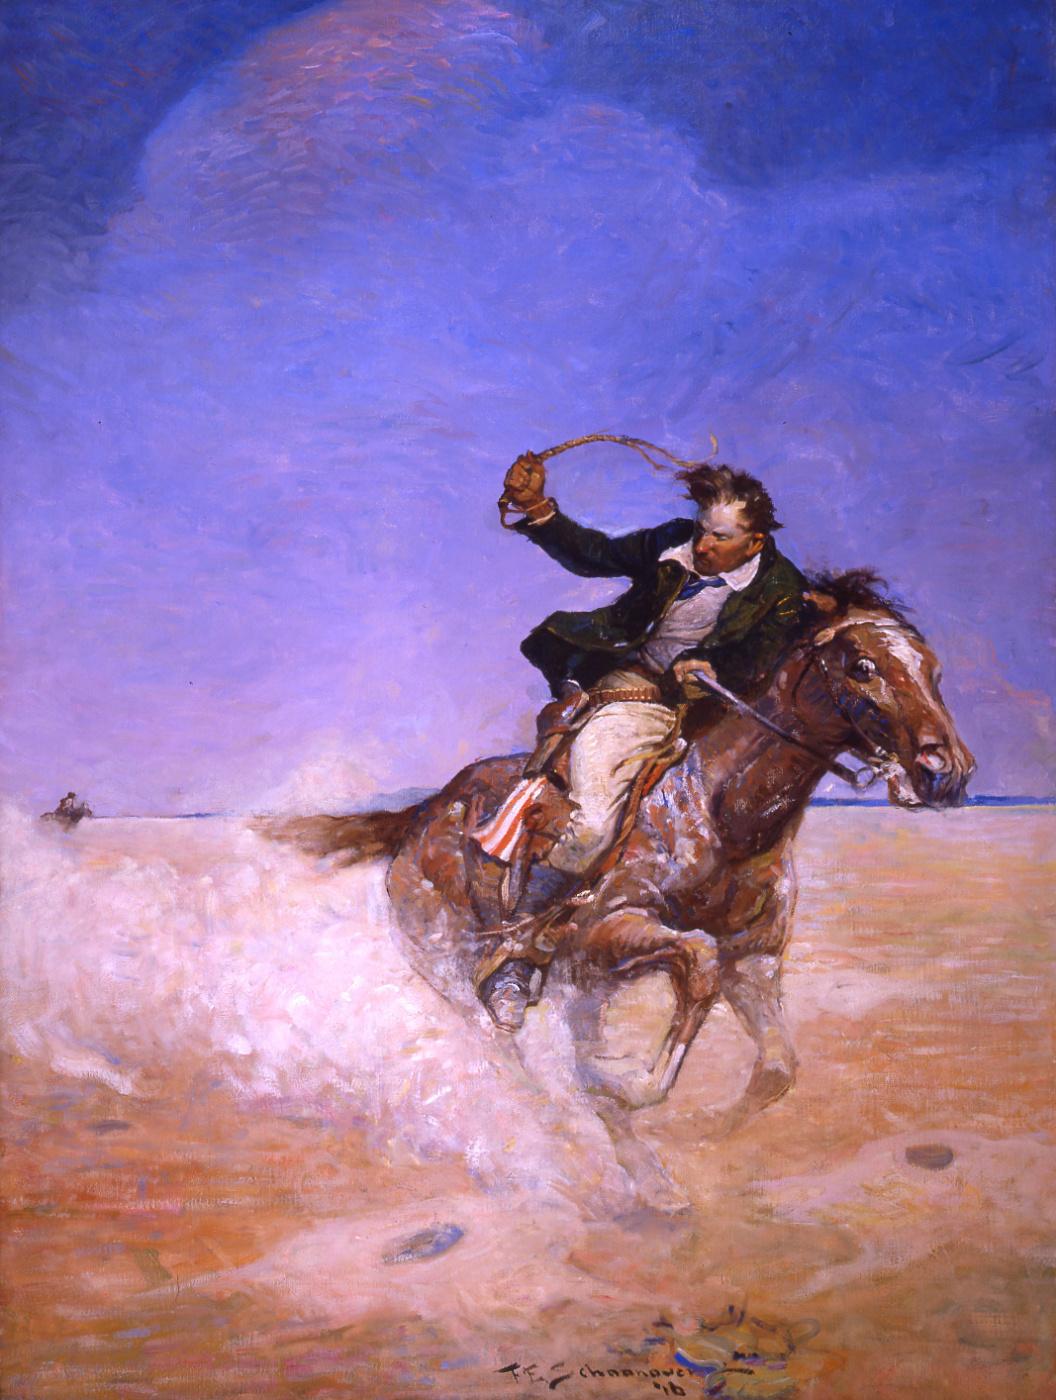 Frank Shunover. Abe Caterson chases Masten through the desert